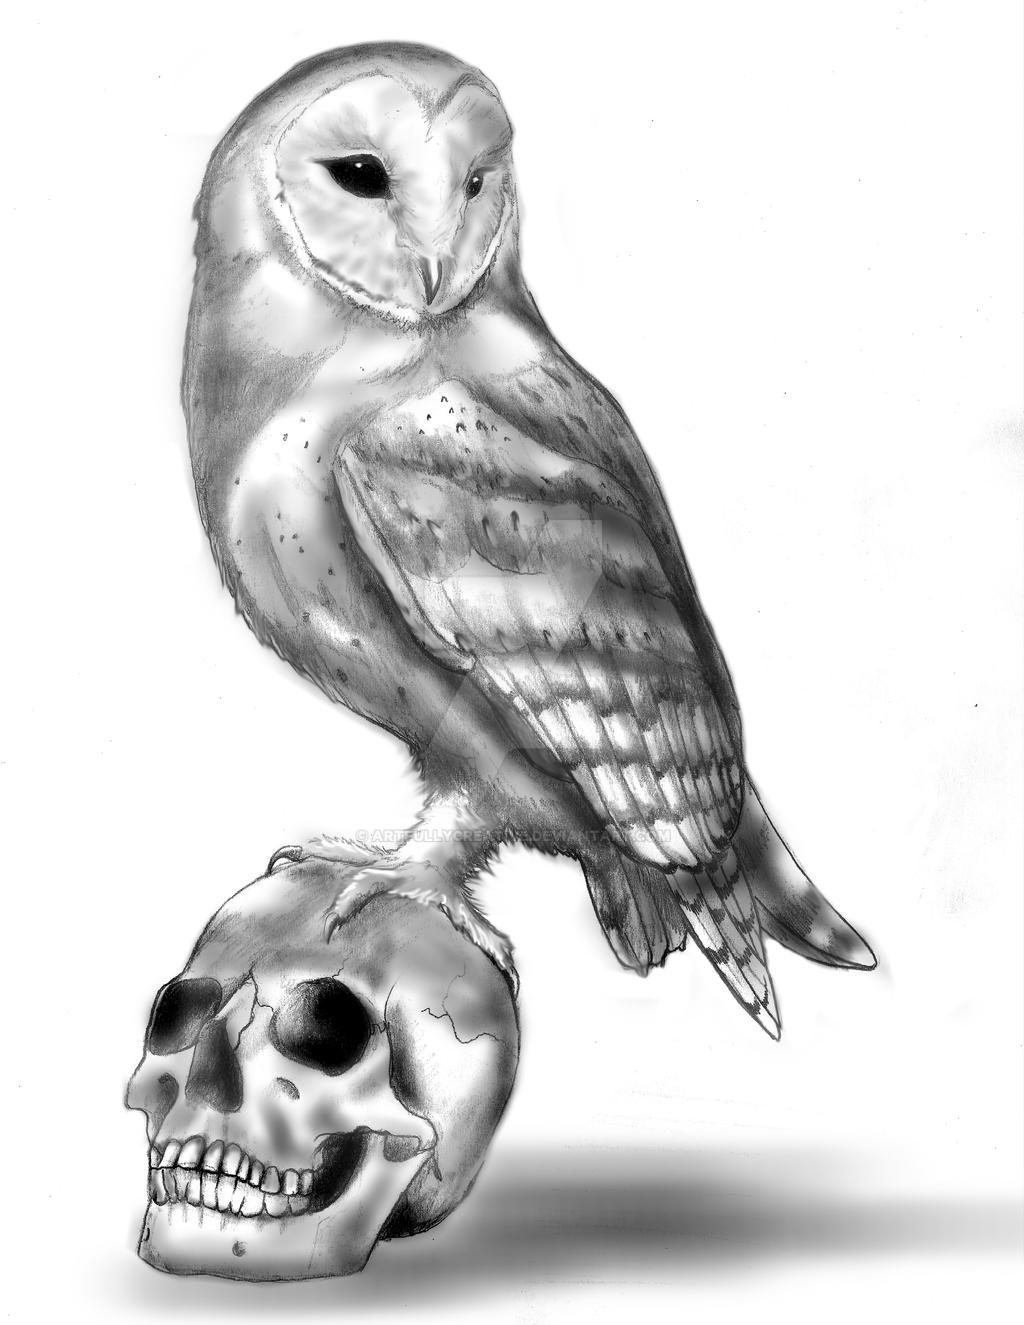 Owl and skull by artfullycreative on DeviantArt